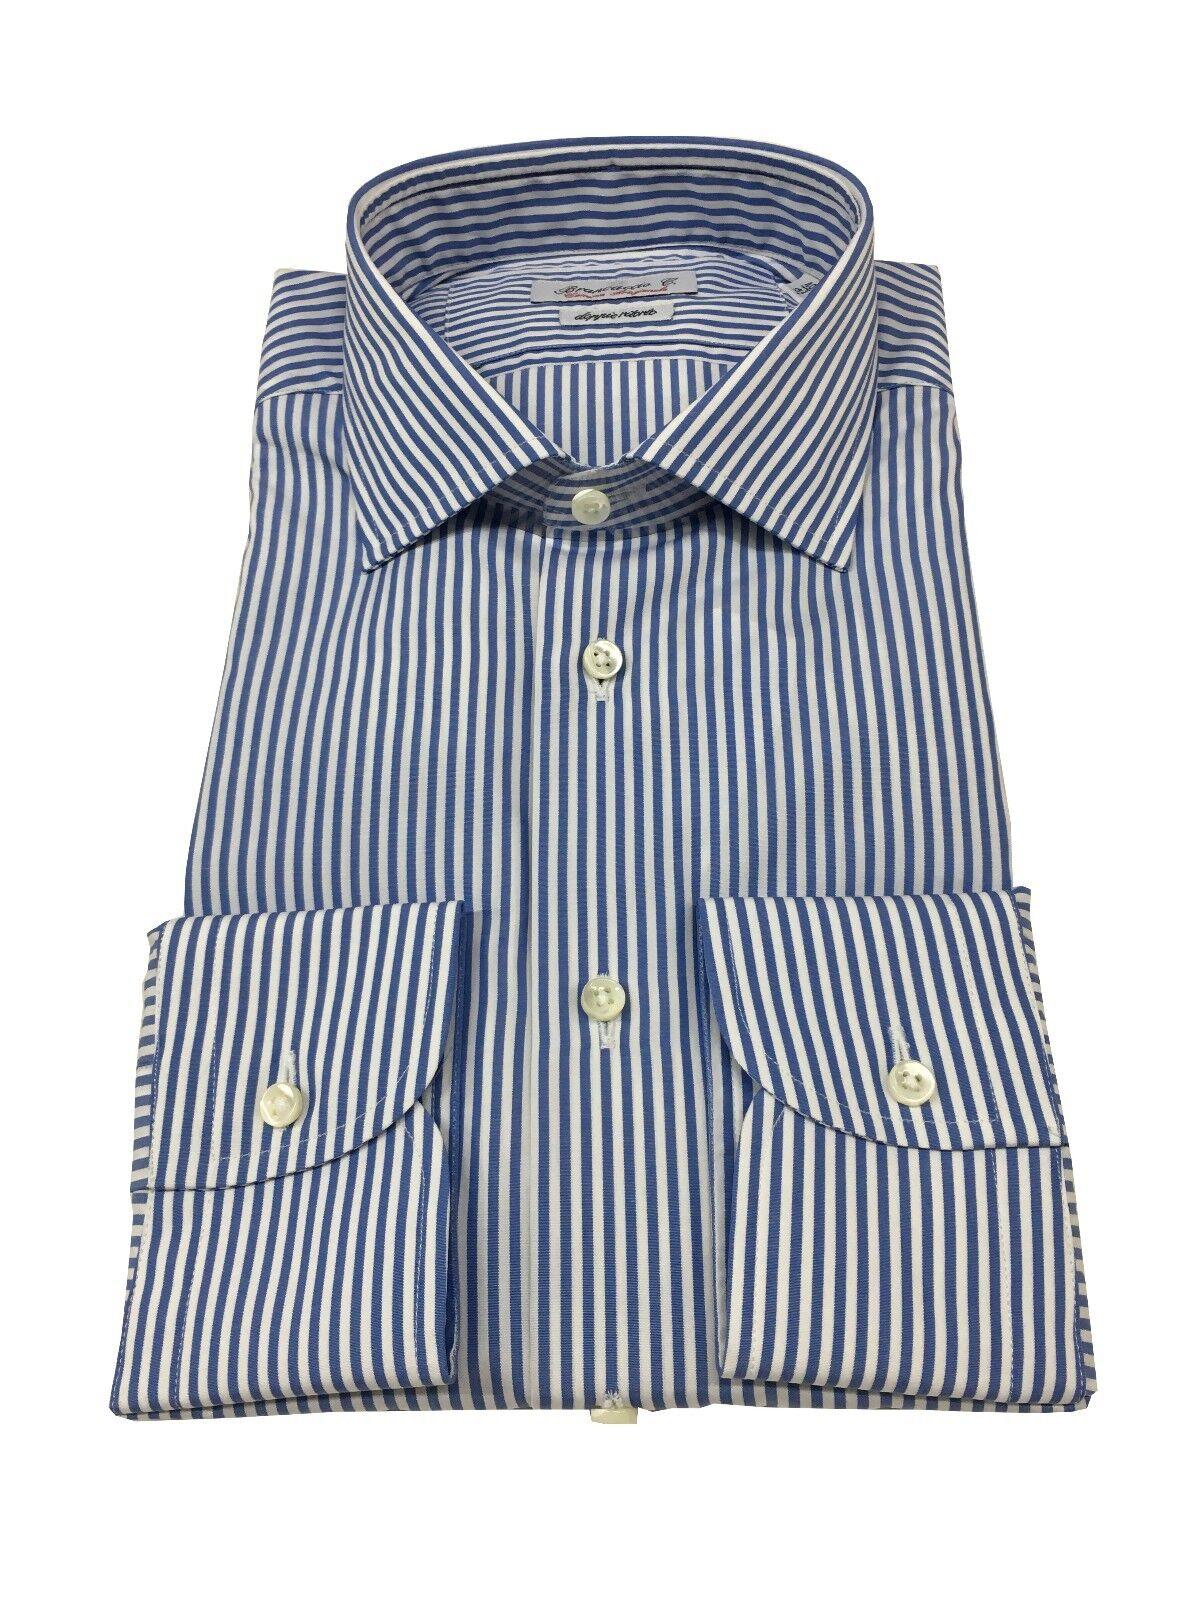 BRANCACCIO men's shirts striped white bluee 100%cotton DOUBLE TWISTED slim